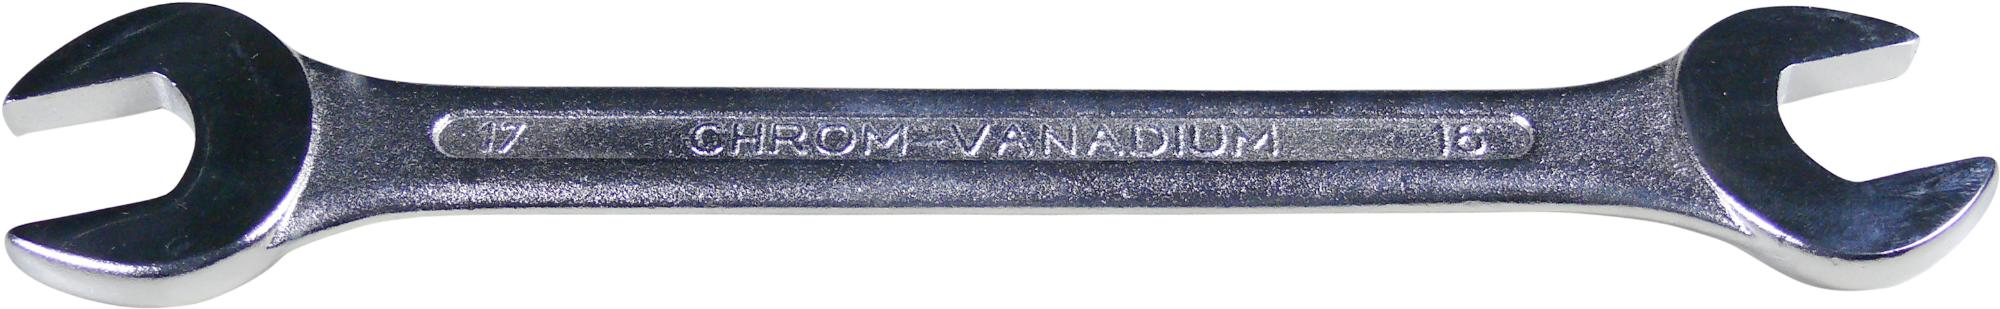 Kľúč vidlica-vidlica, 25x28 mm